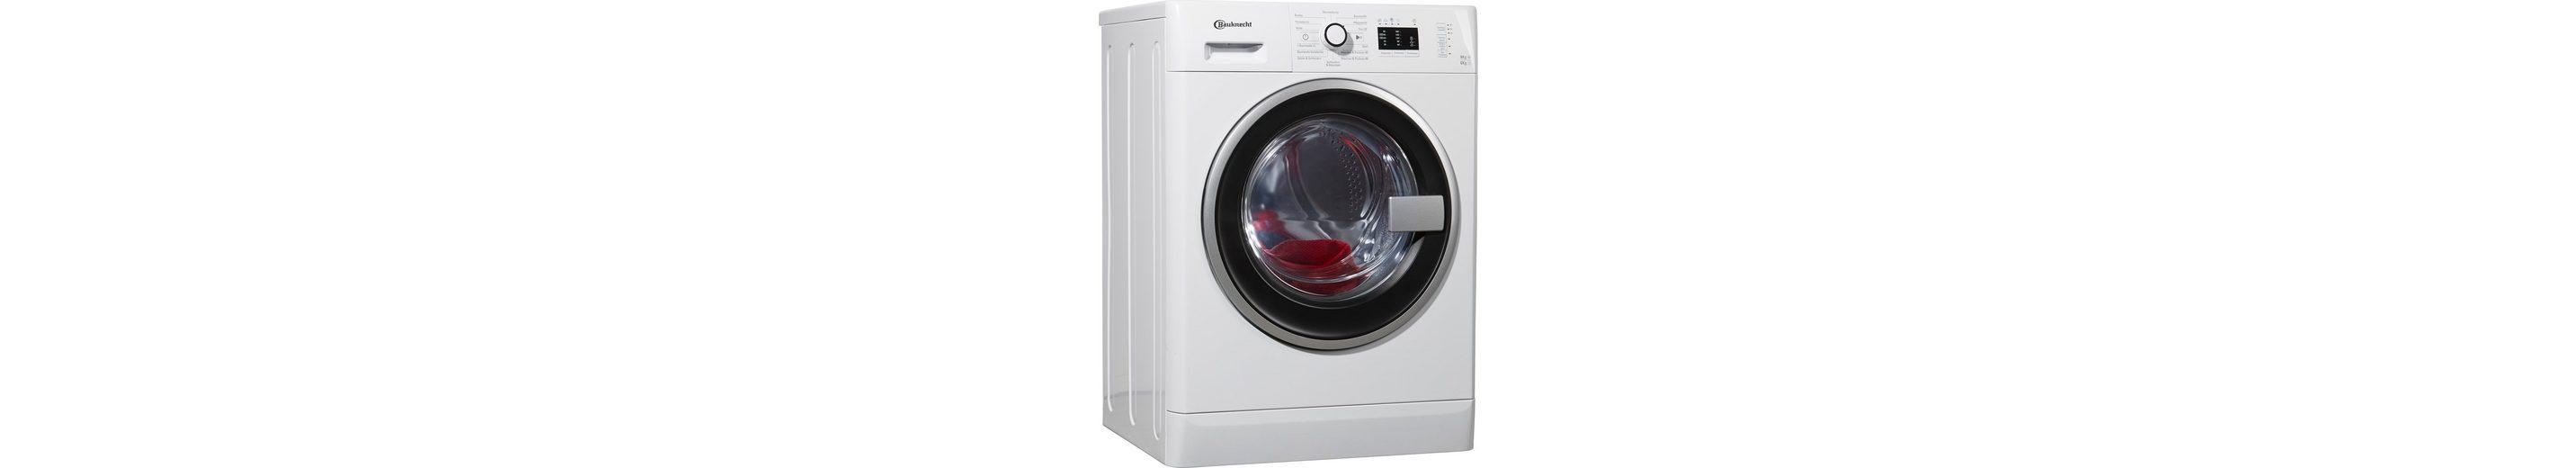 BAUKNECHT Waschtrockner WATK Prime 8614, A, 8 kg / 6 kg, 1400 U/Min